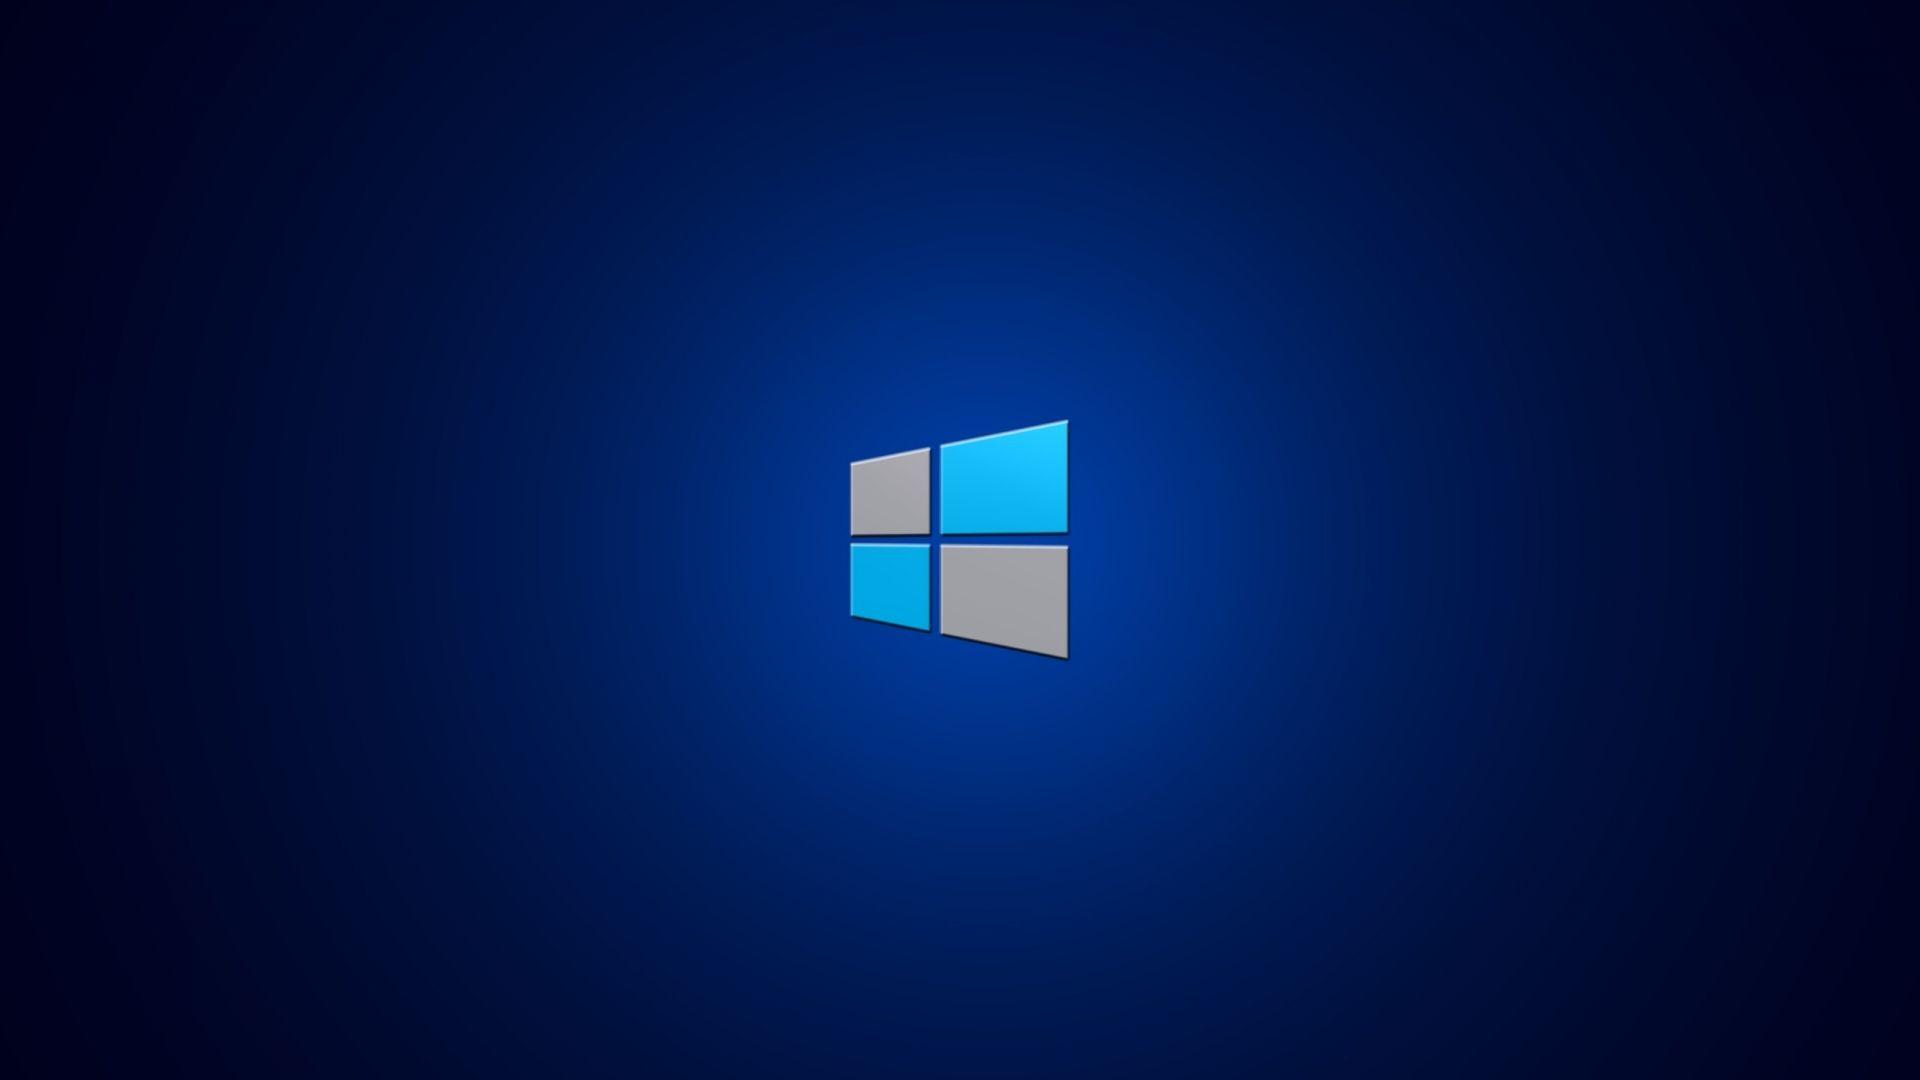 Windows 81 Wallpaper Remodeled Hd Desktop Wallpaper